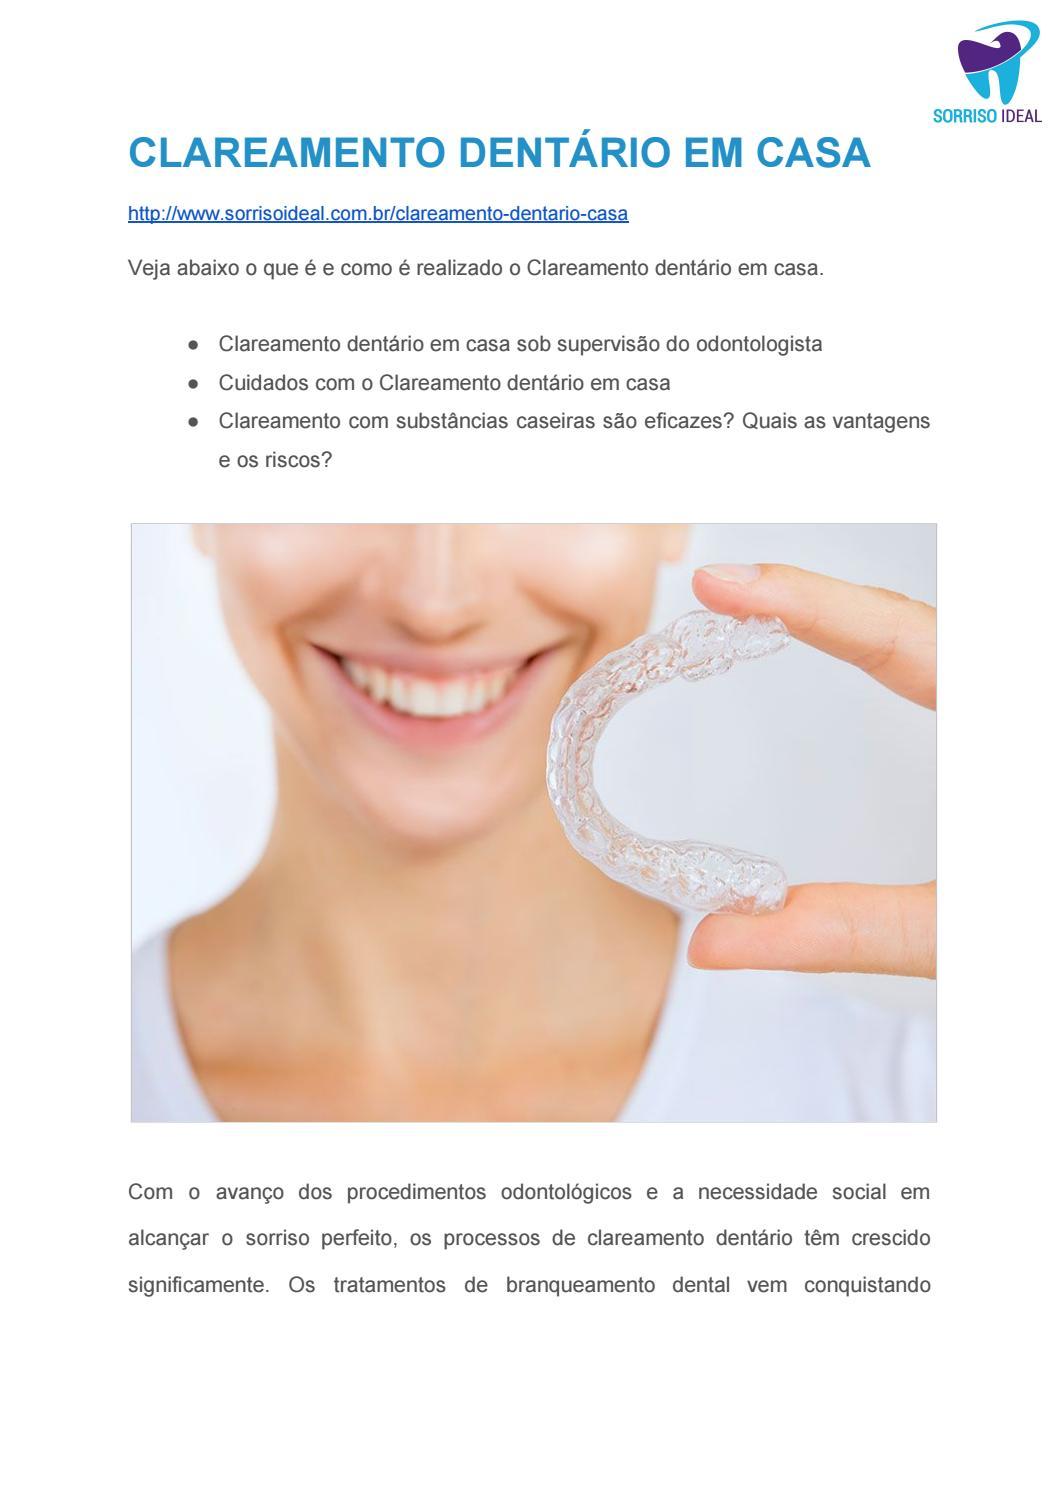 Clareamento Dentario Em Casa By Sorriso Ideal Issuu